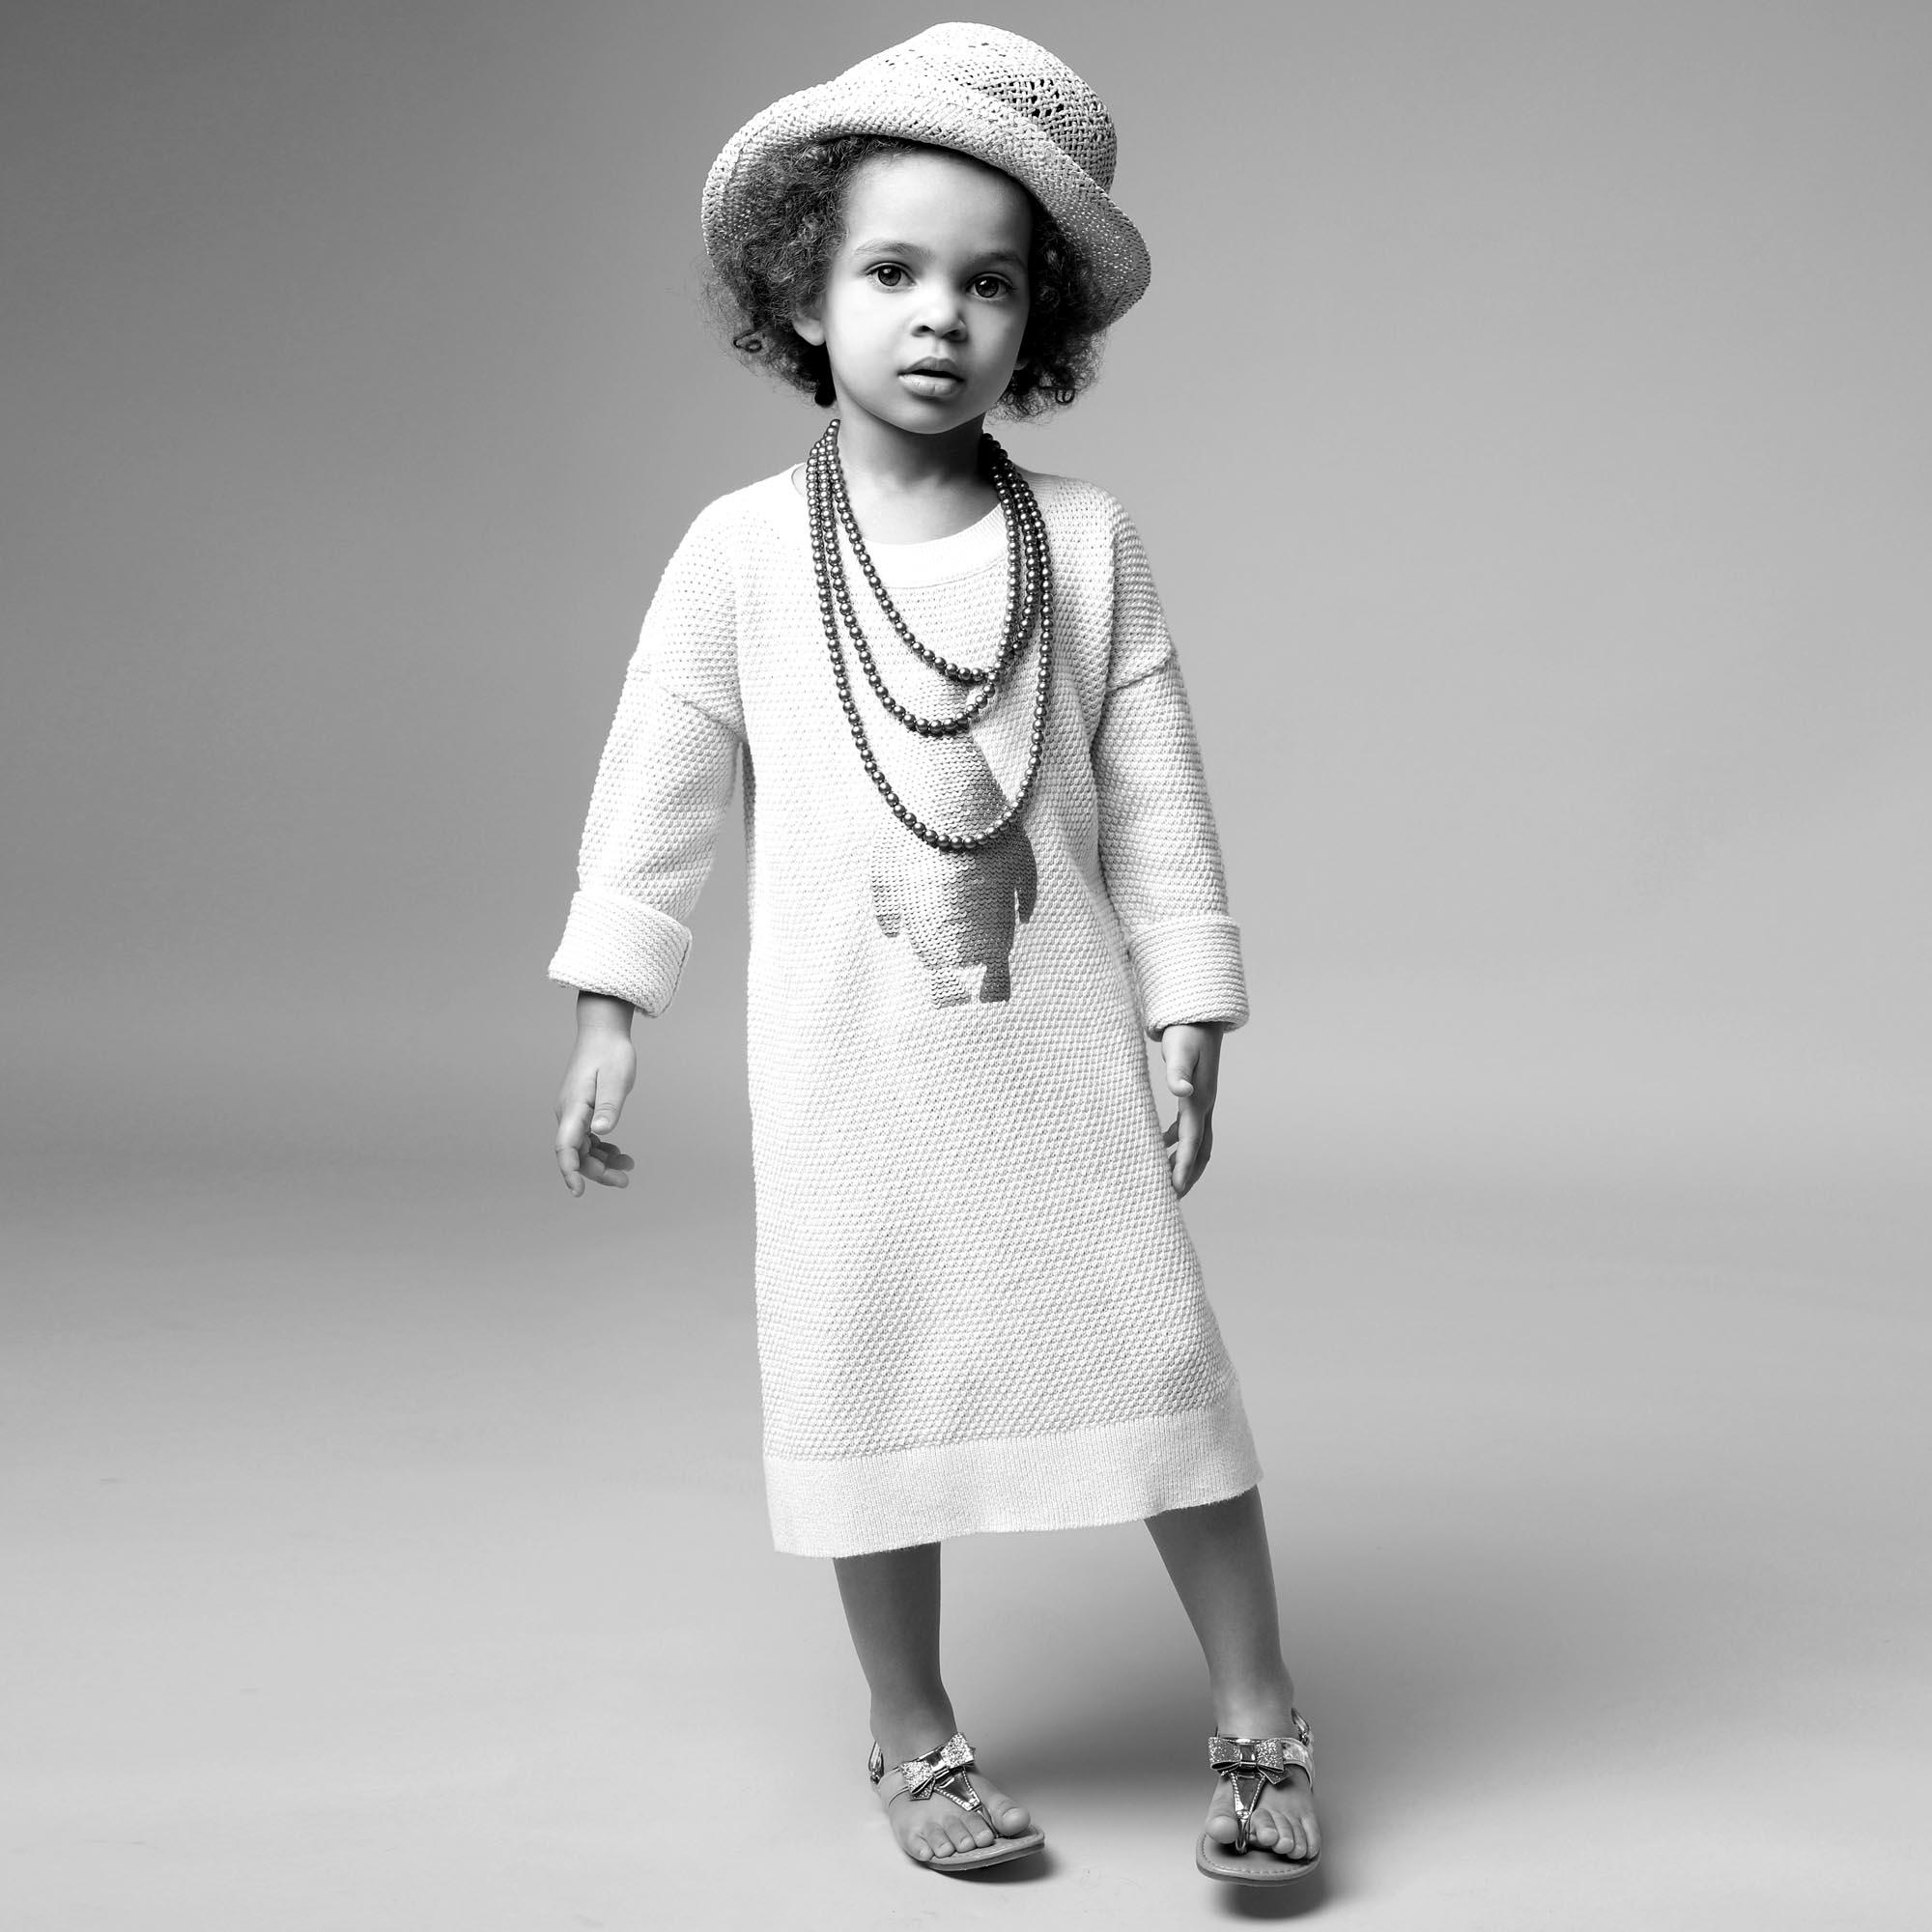 nyc-photographers-kids-modeling-10019.jpg